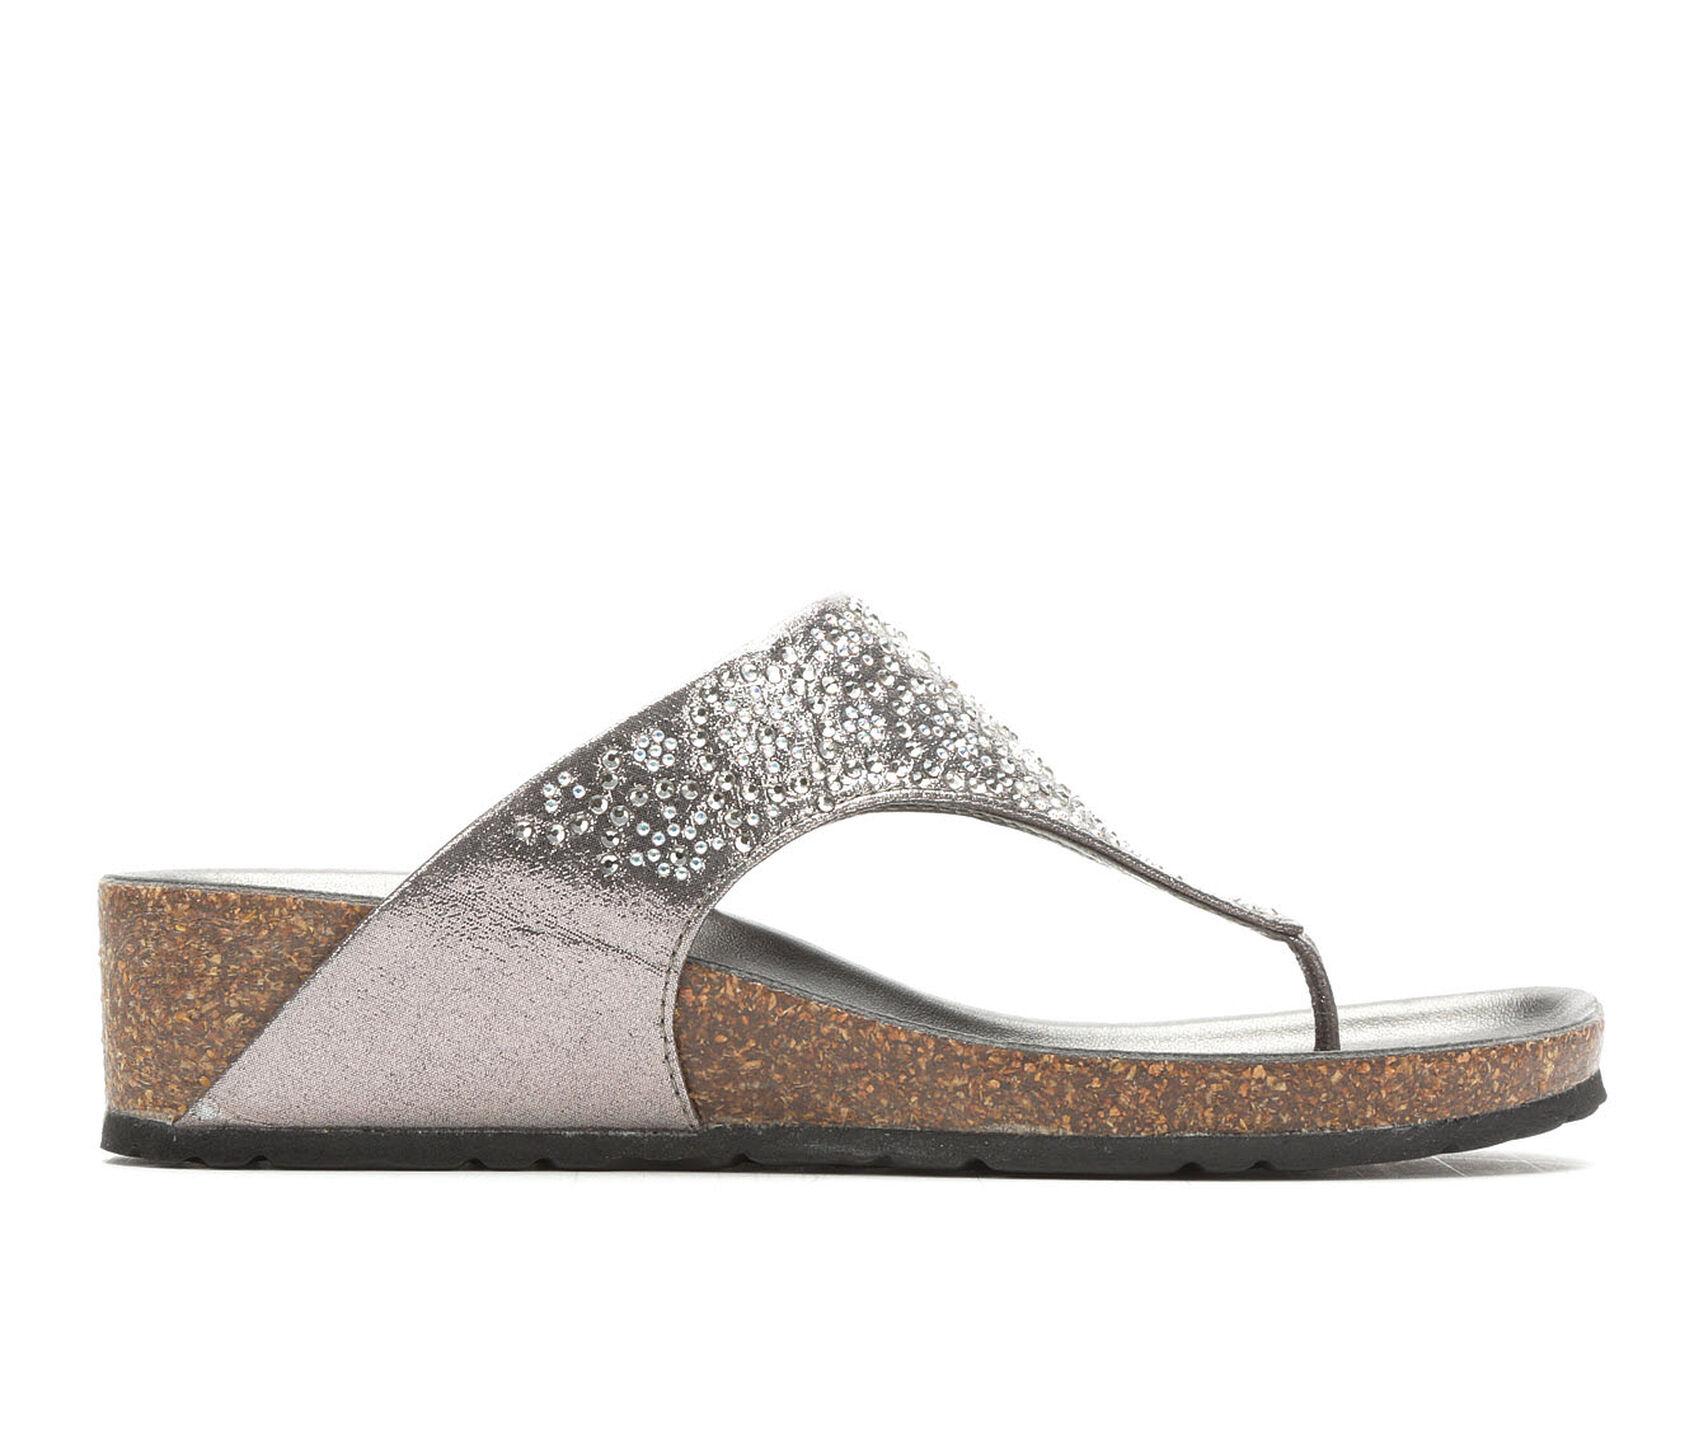 9ea13761e1ef Women s Italian Shoemakers Heisy Wedge Sandals